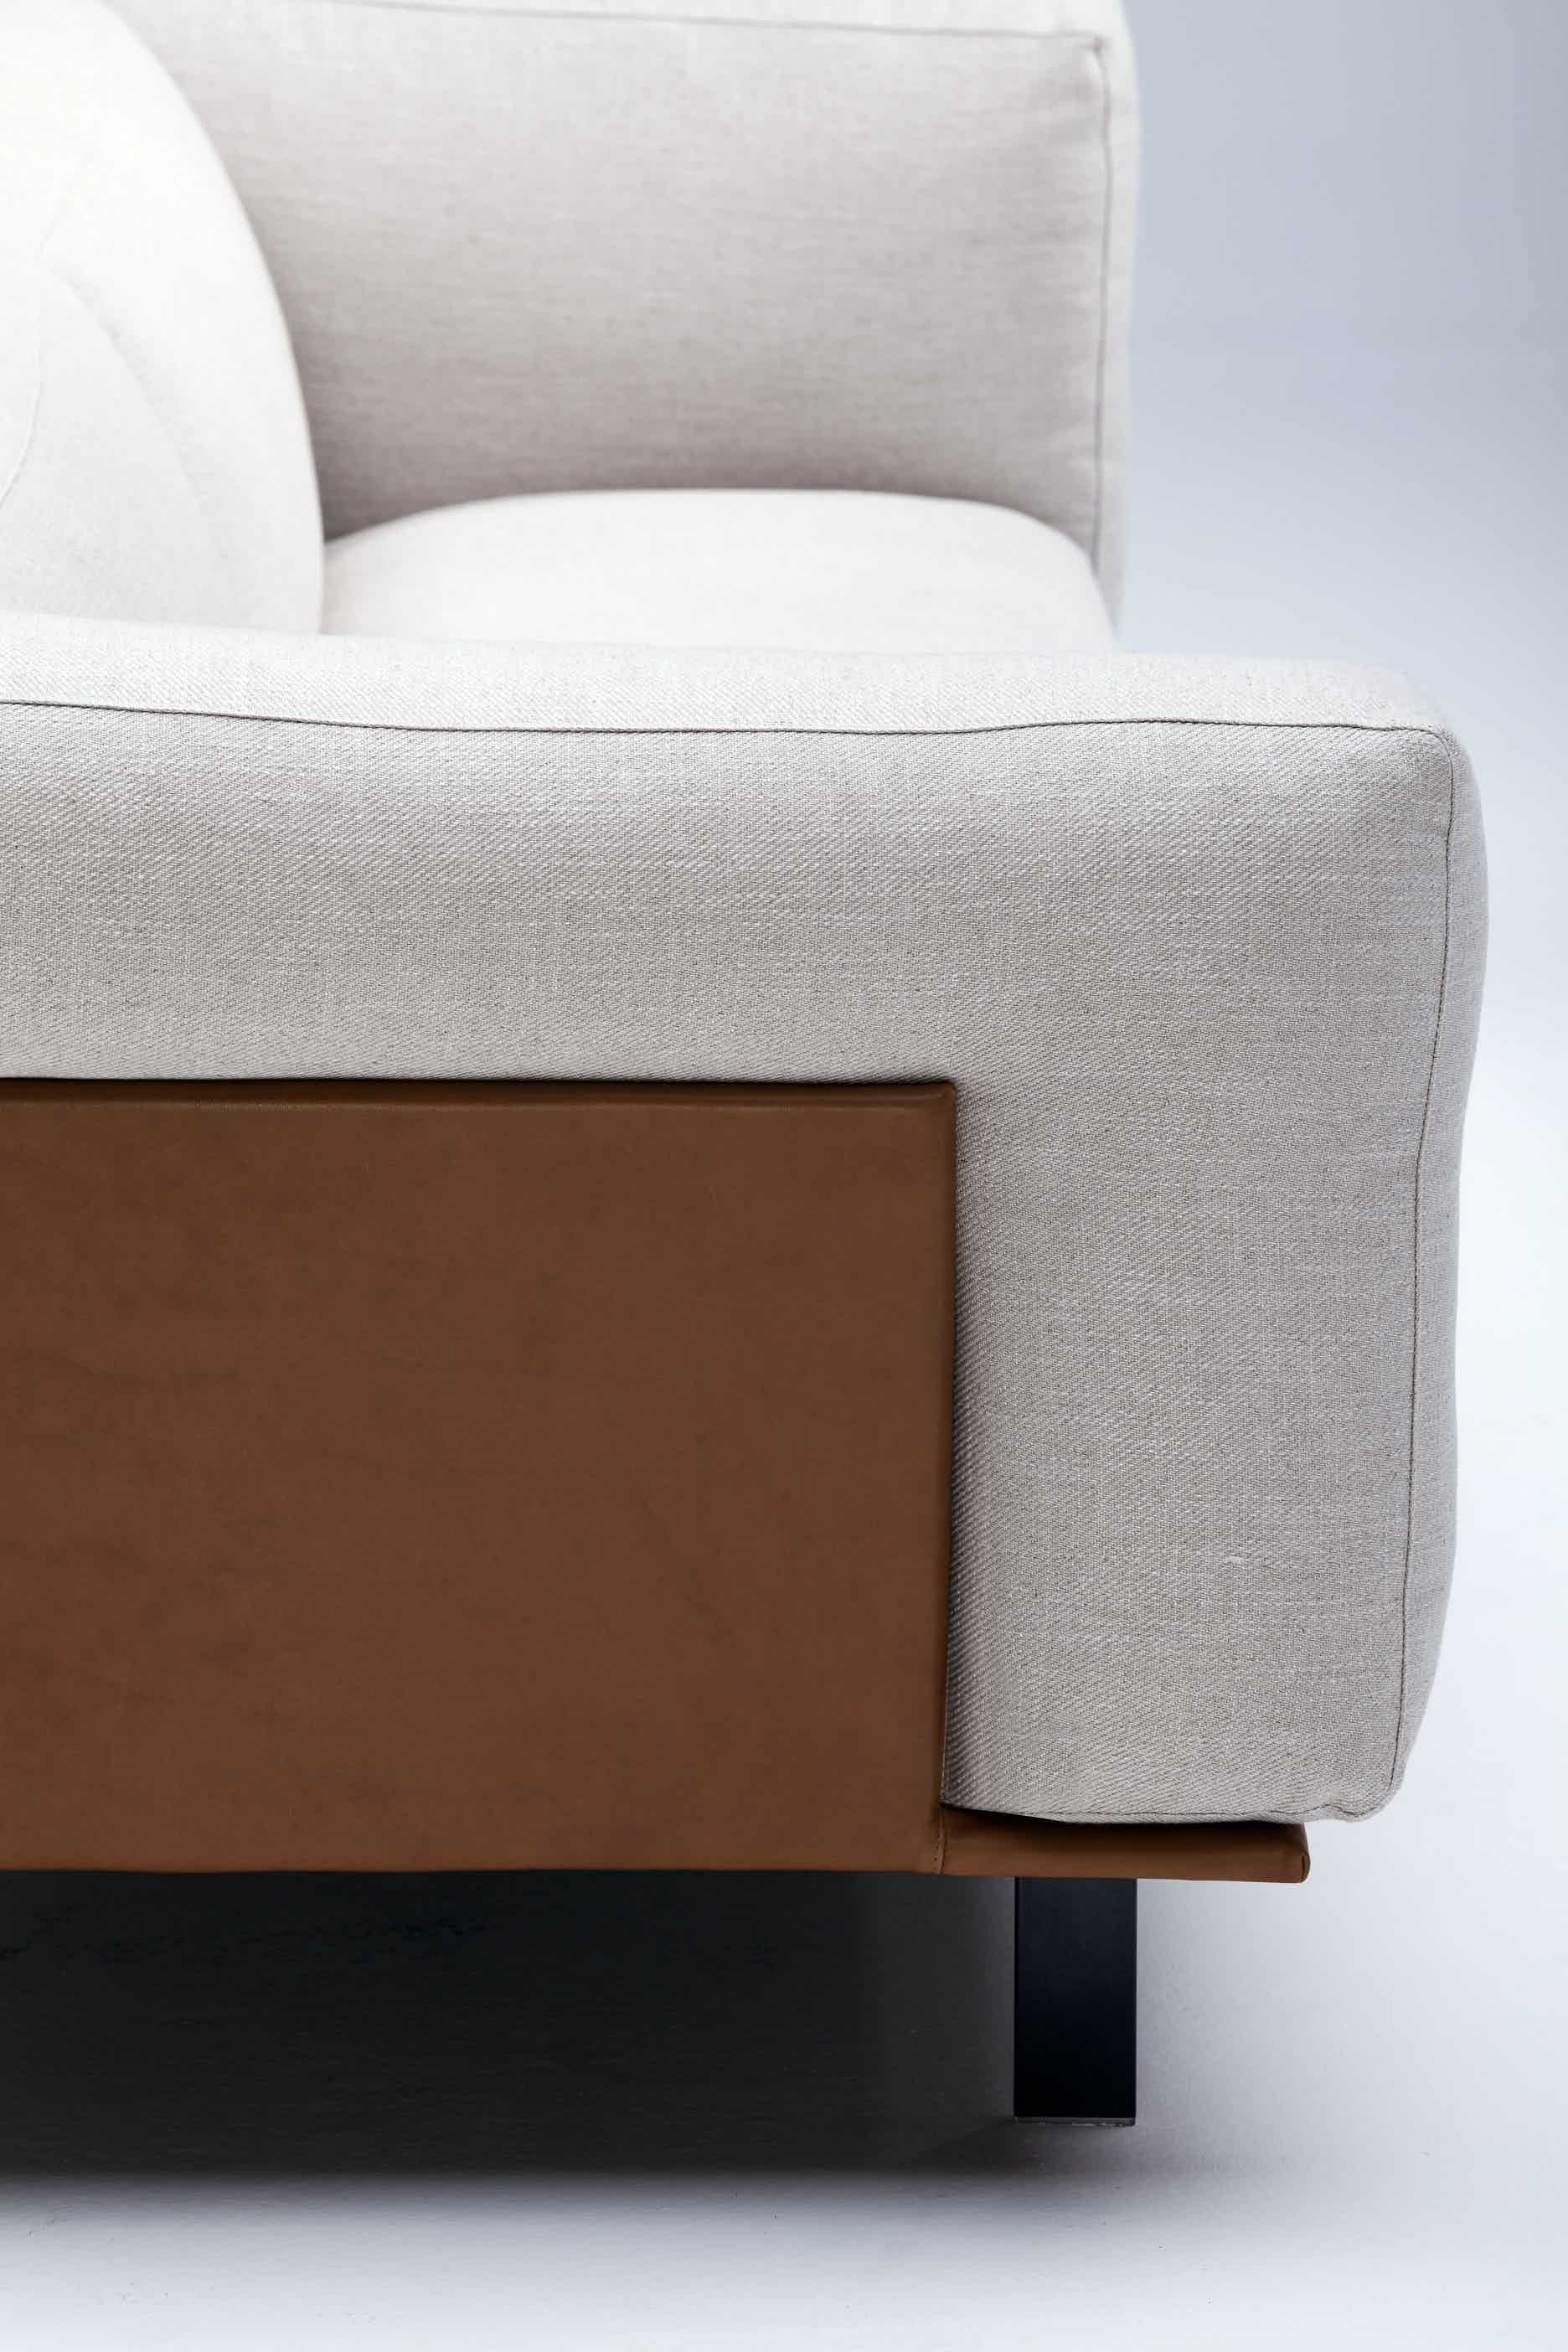 Linteloo-side-recess-sofa-institu-haute-living